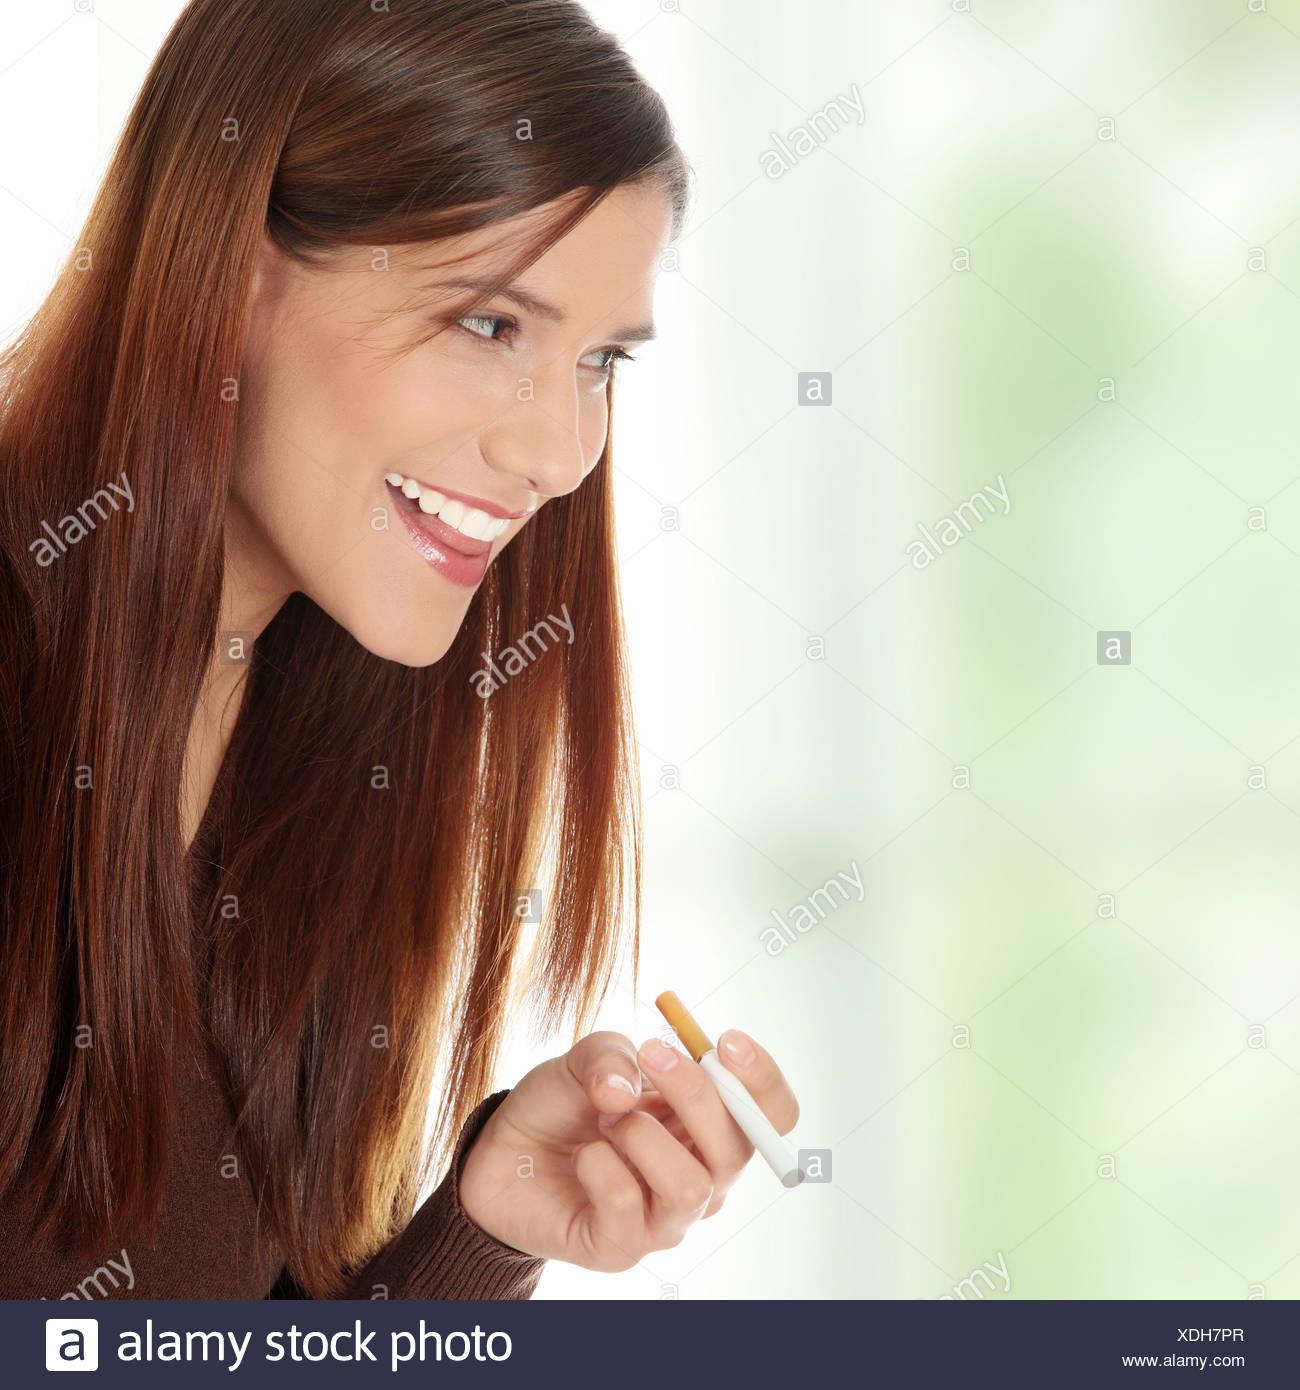 Young woman smoking electronic cigarette (ecigarette) - Stock Image